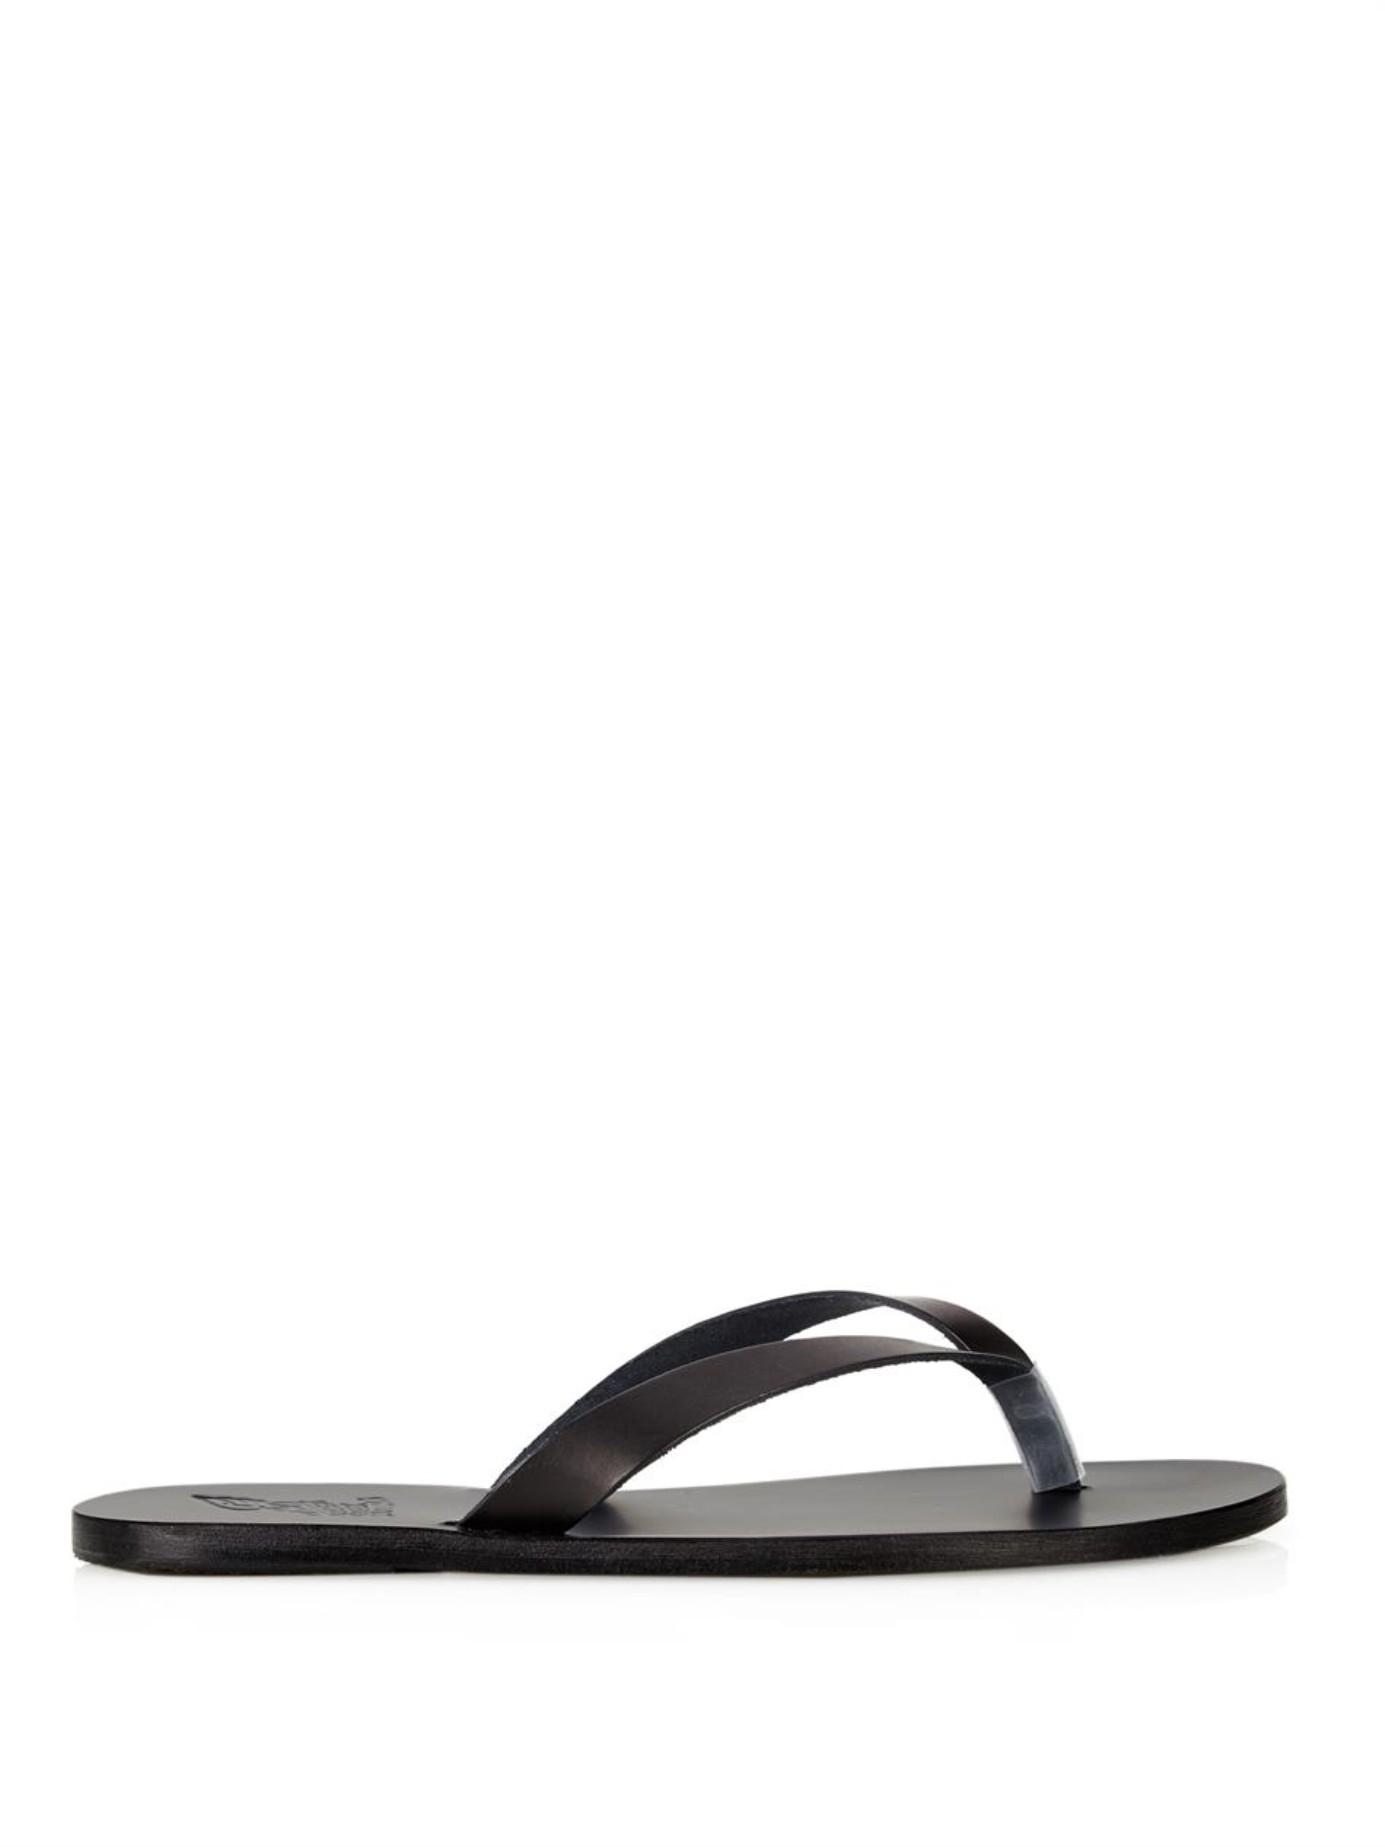 8c9a5ddd7095ce Ancient Greek Sandals Hero Leather Flip-Flops in Black for Men - Lyst